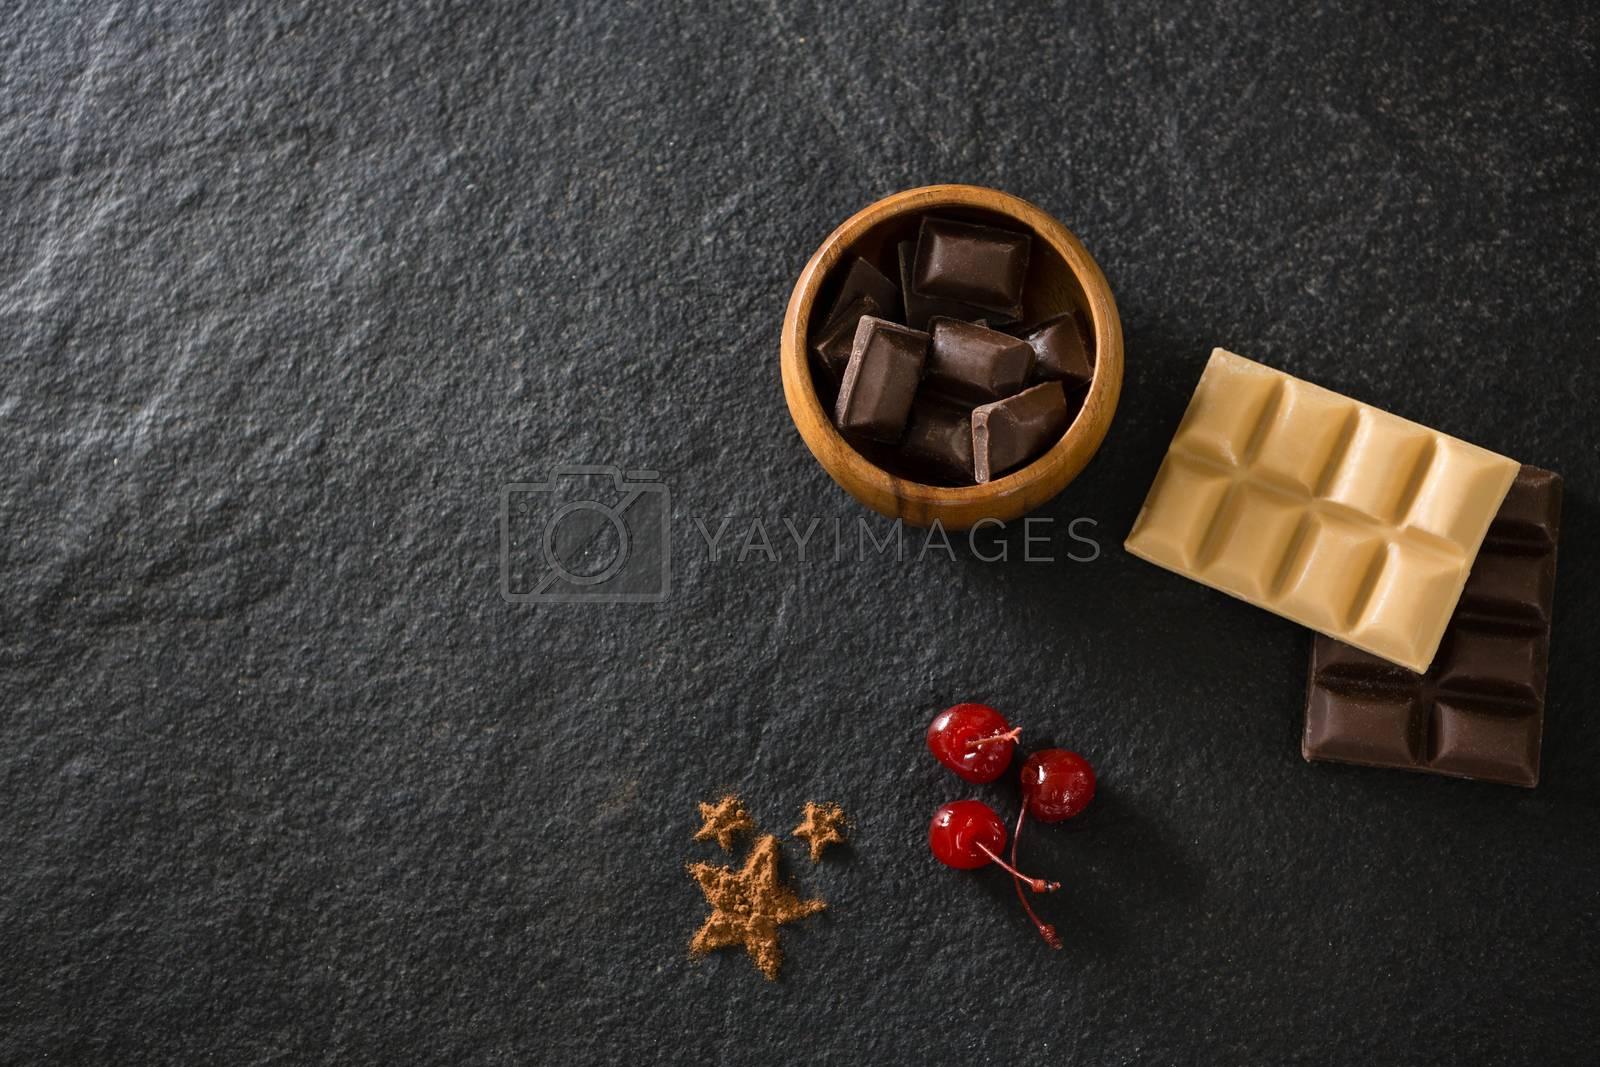 Chocolates and fruit on concrete background by Wavebreakmedia